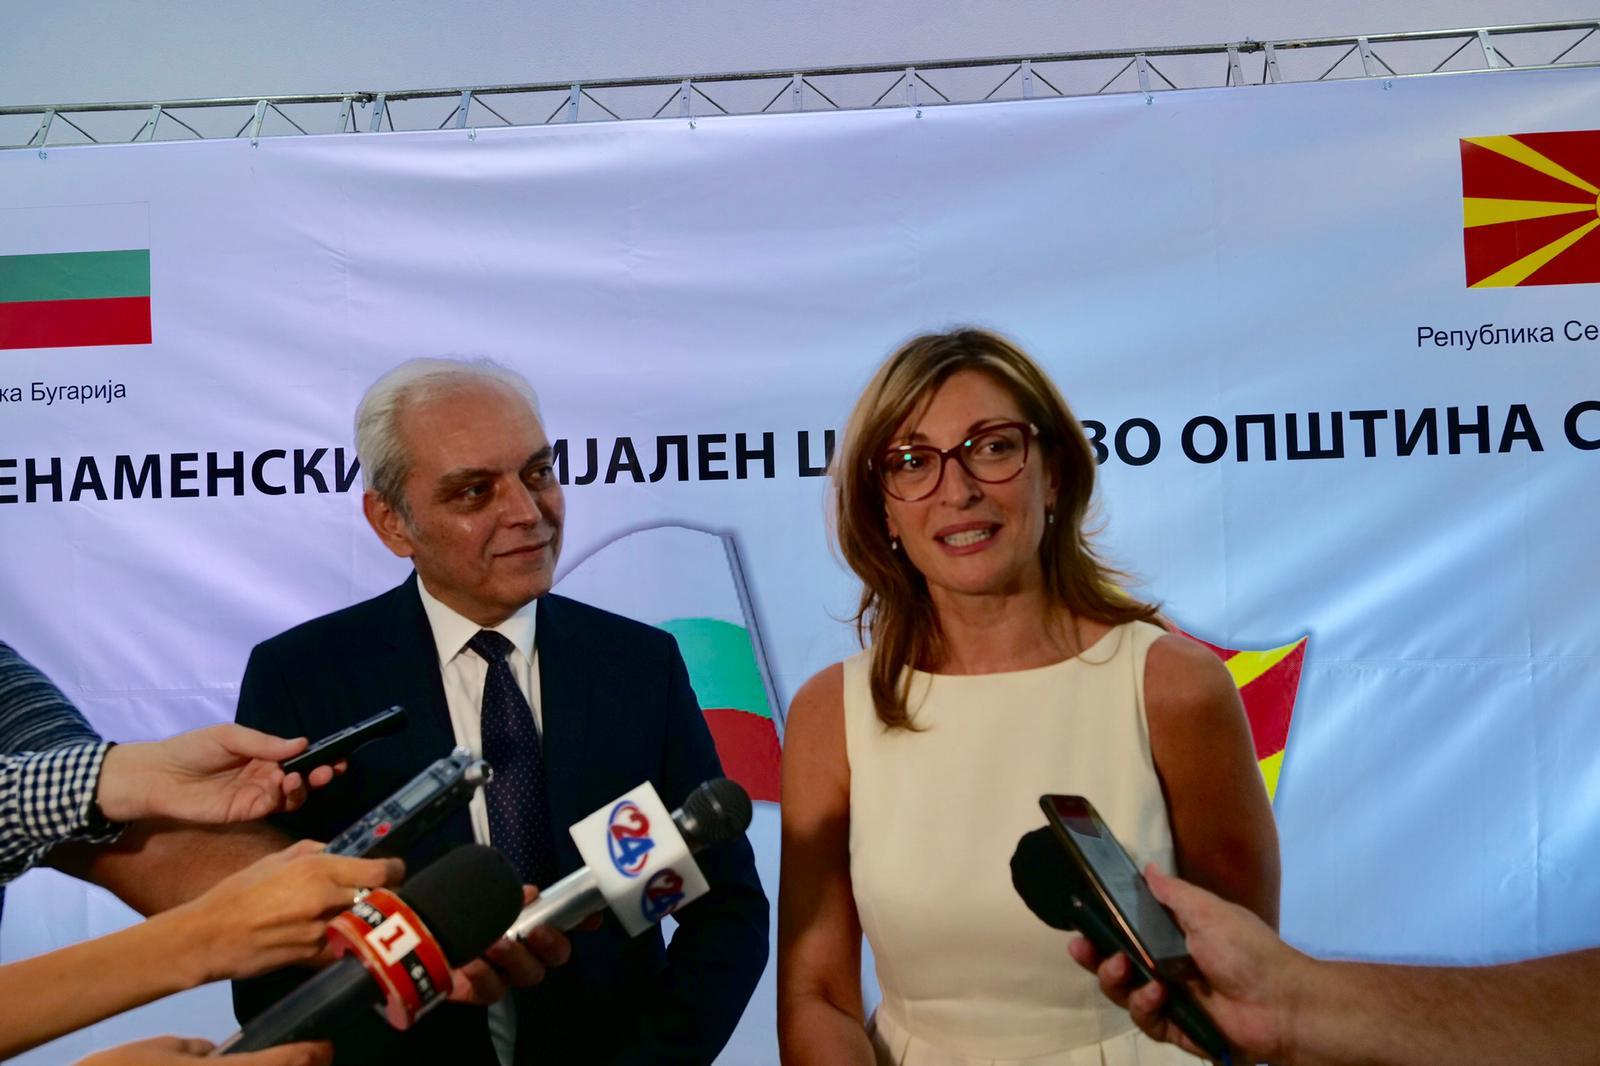 Bulgaria giving North Macedonia a million leva in development aid in 2019